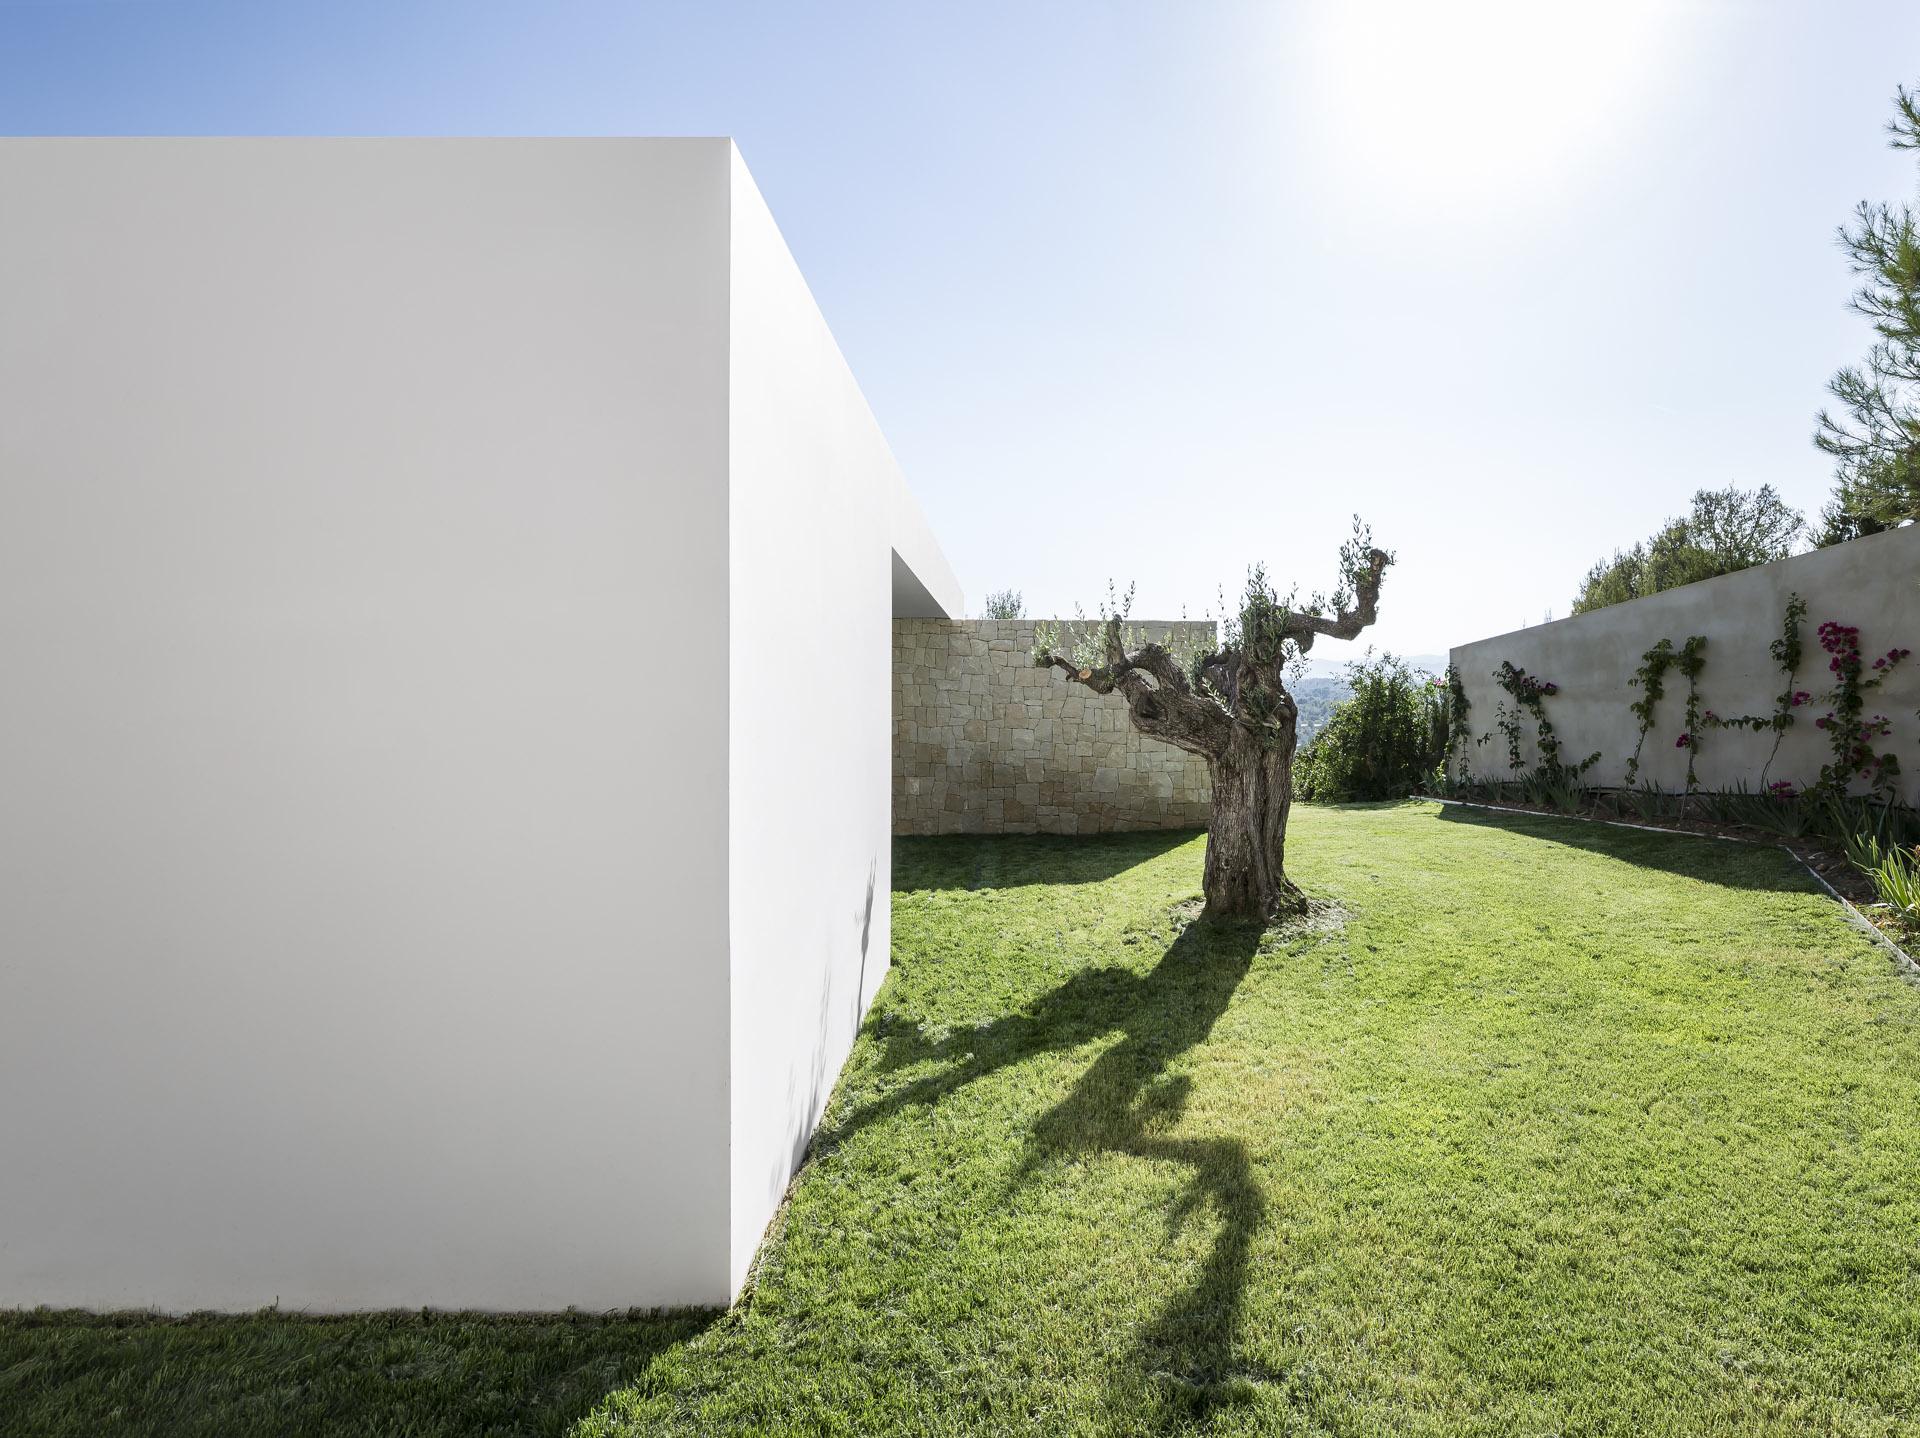 fotografia-arquitectura-valencia-german-cabo-gallardo-llopis-villamarchante-vivienda-12